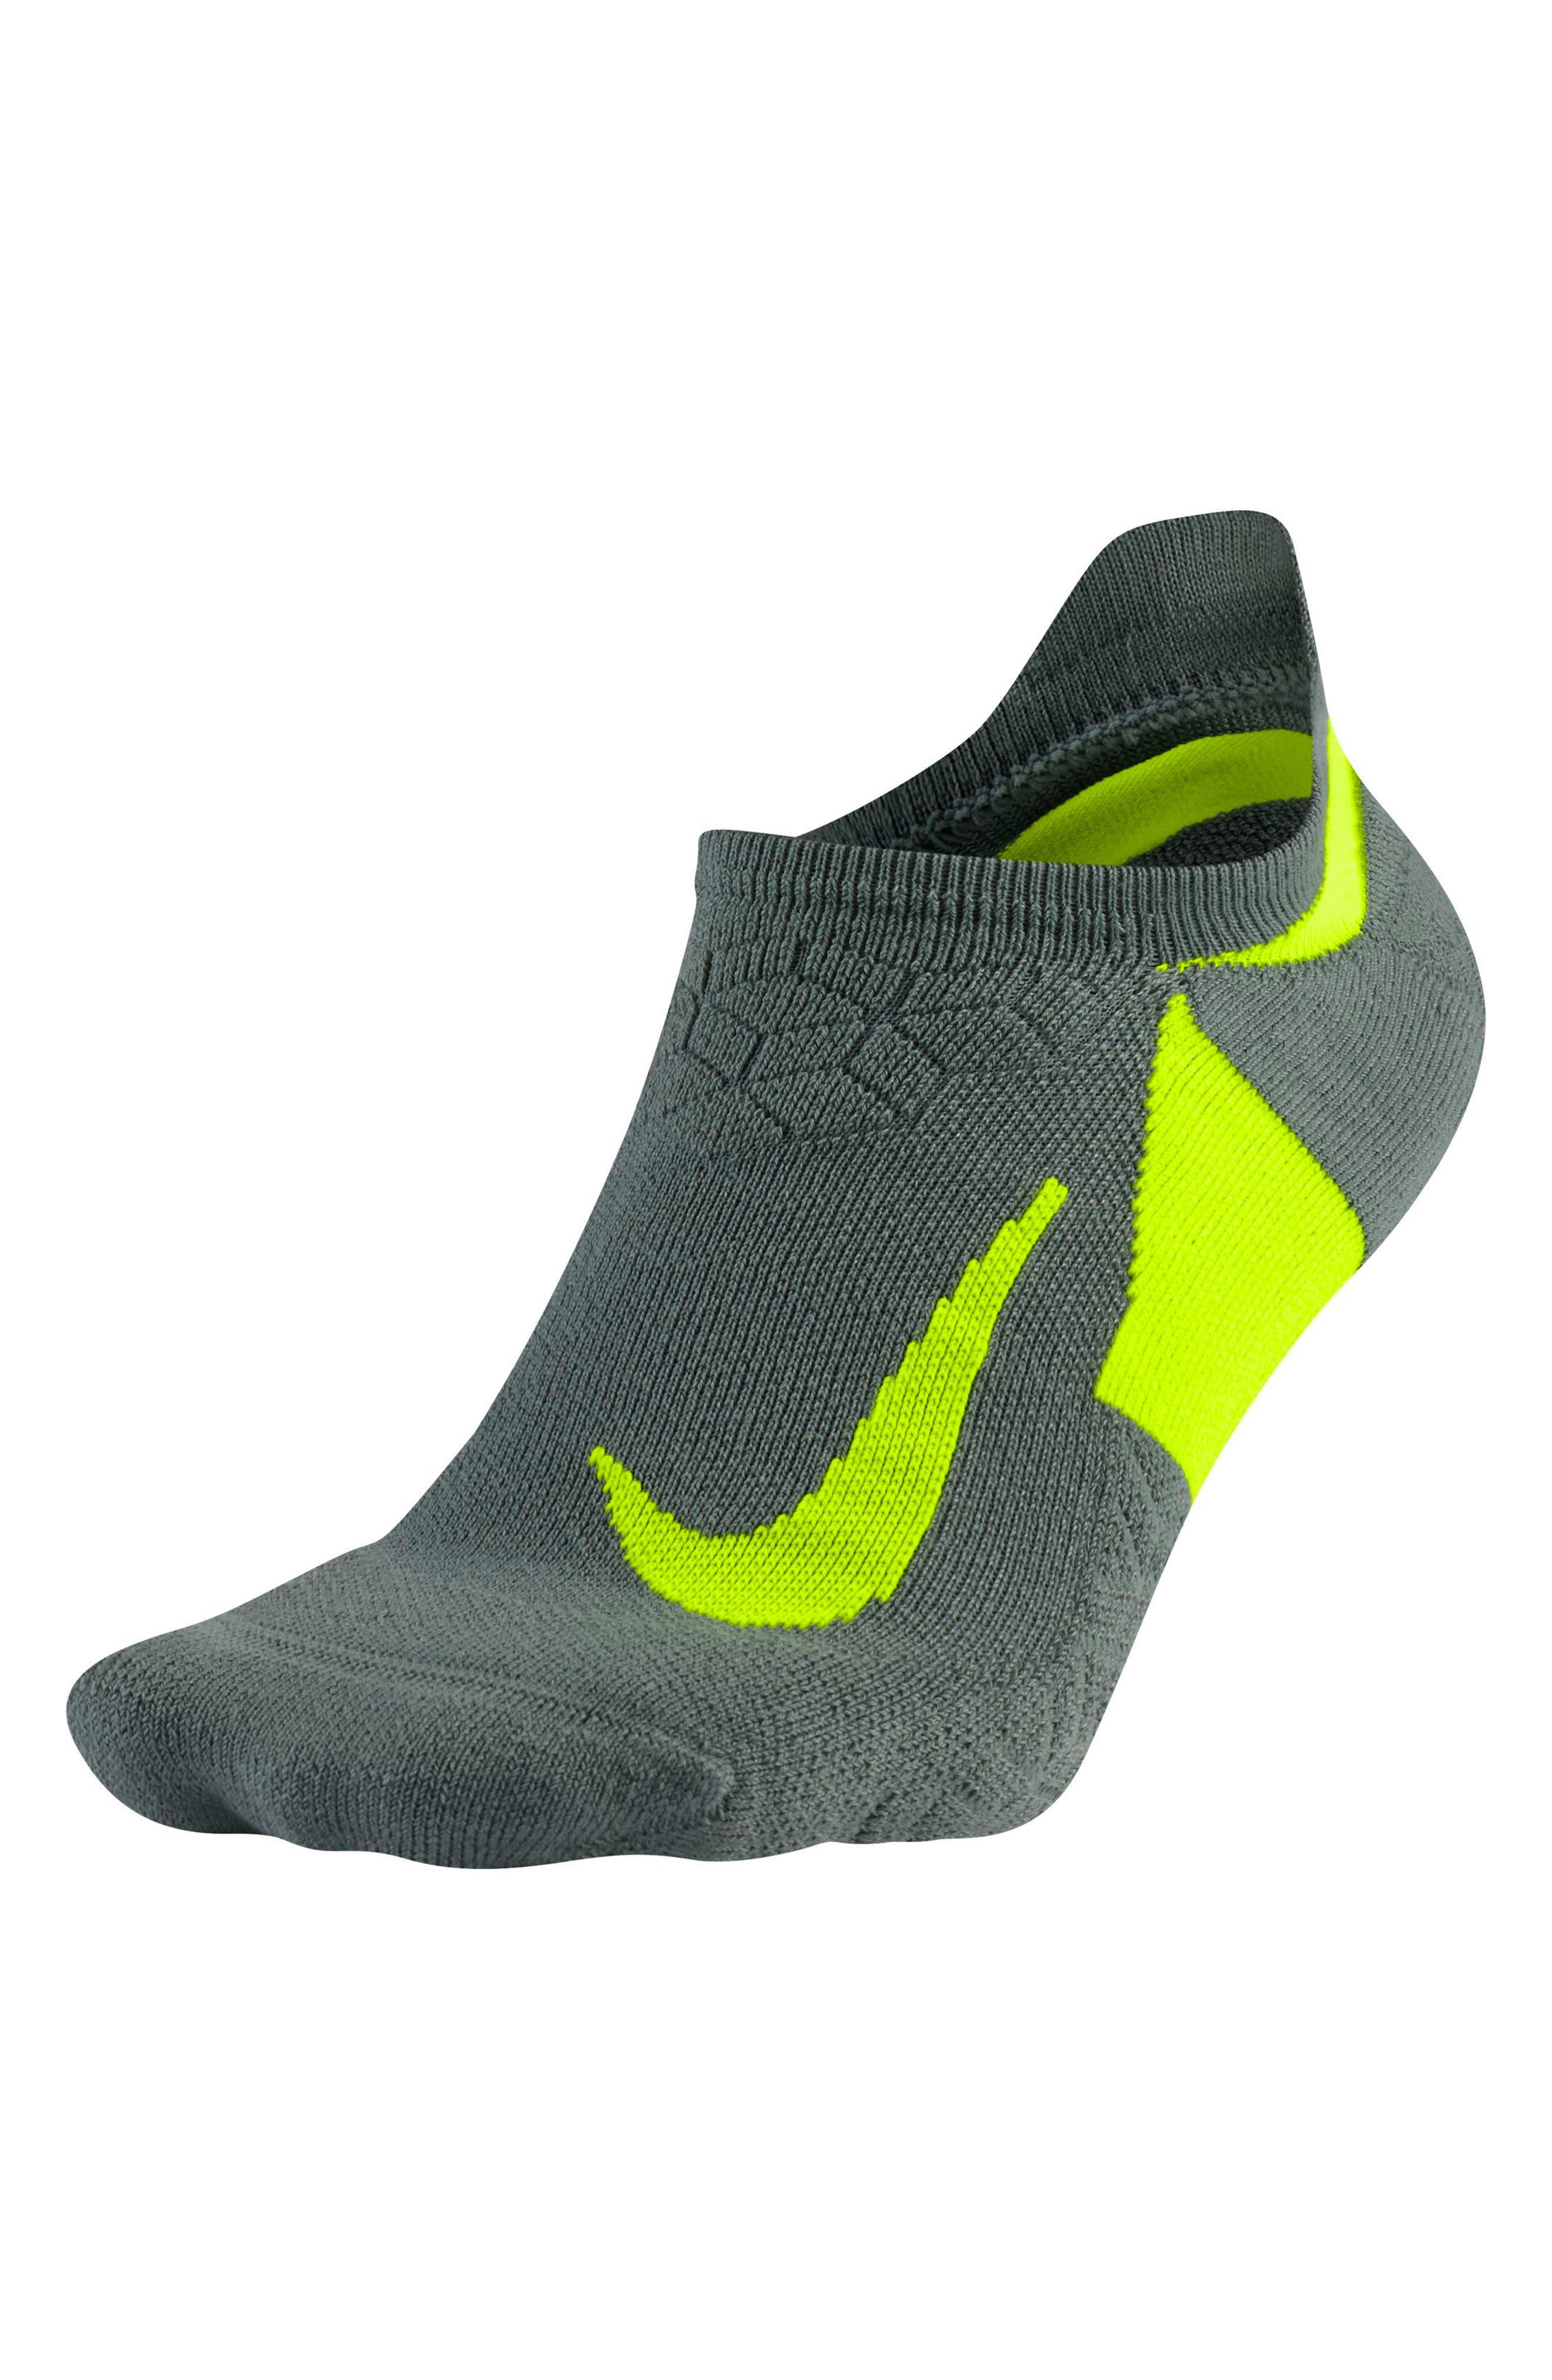 Main Image - Nike Elite Cushioned No-Show Tab Running Socks